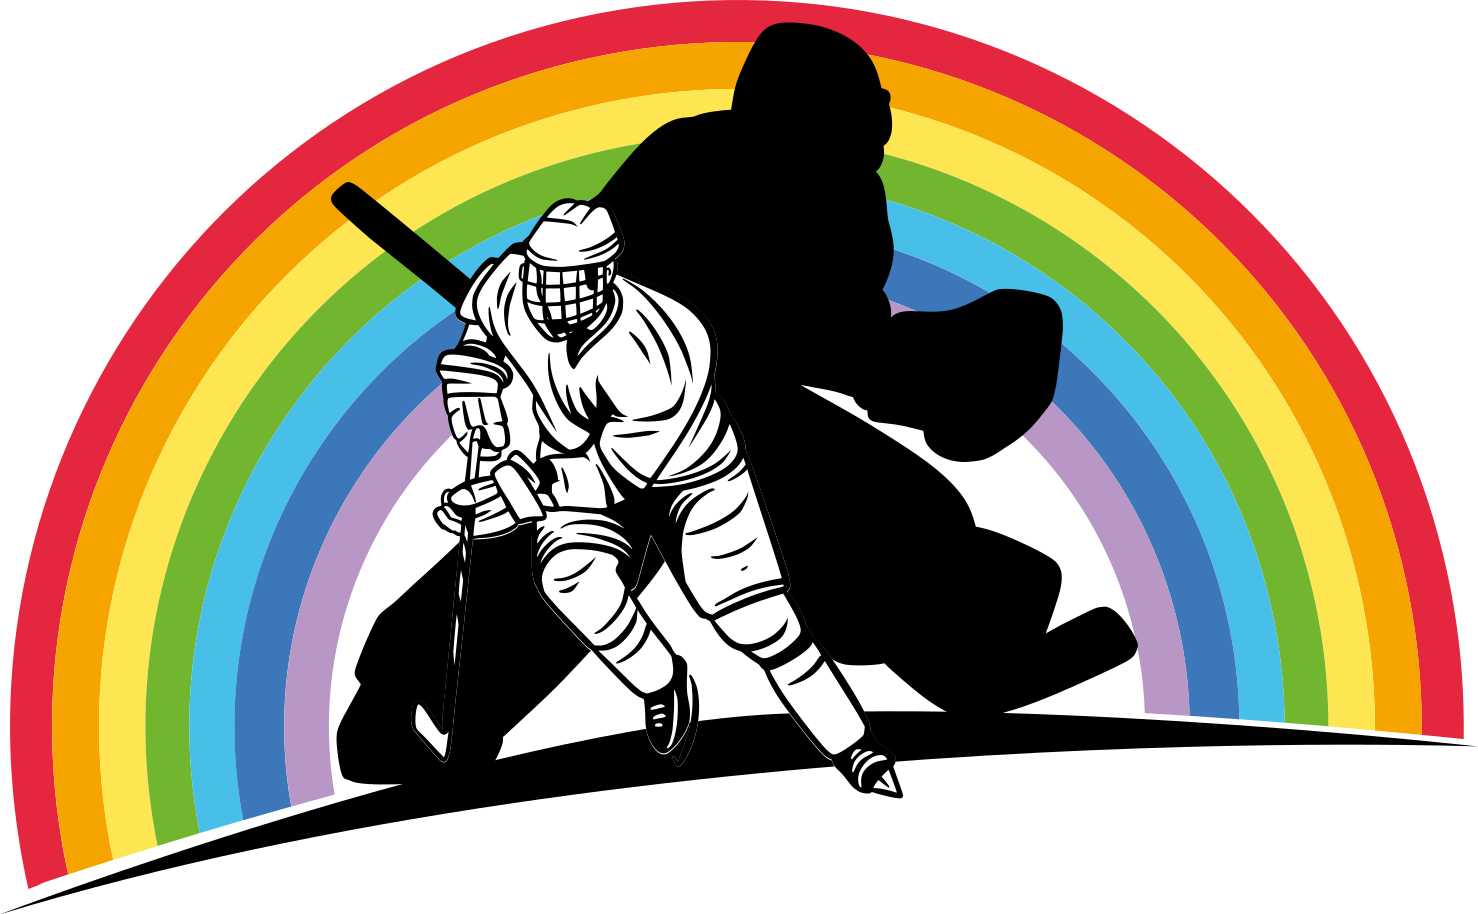 TENSTICKERS. レインボーホッケーウォールステッカー. 虹の背景に2人のホッケー選手を描いた美しいイラストホッケー選手デカール。それはオリジナルで、耐久性があり、粘着性があり、簡単に塗ることができます。